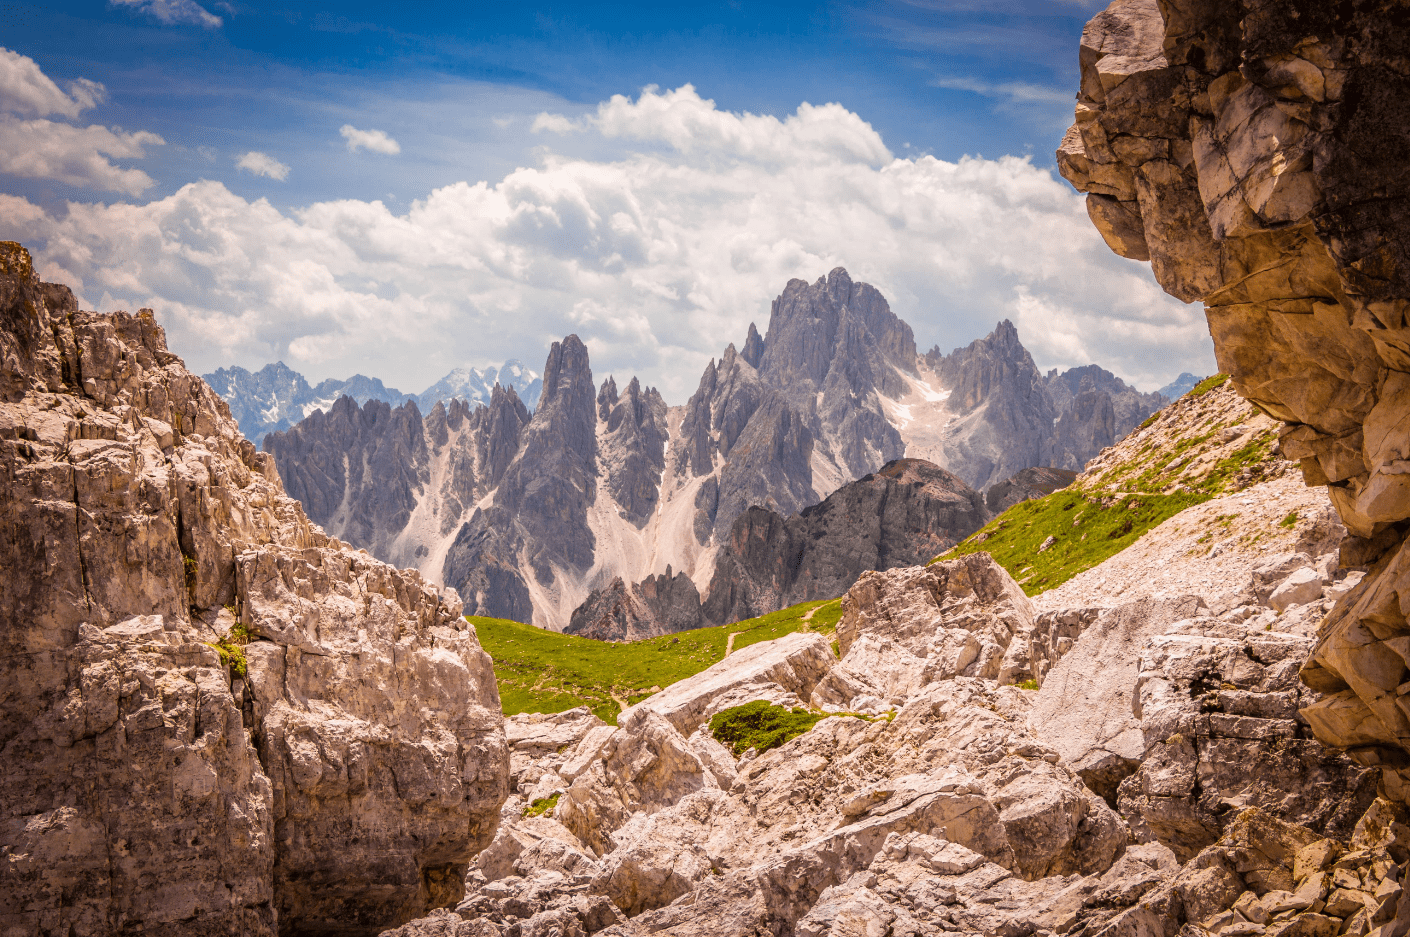 Le Dolomiti e la leggenda dei Monti Pallidi